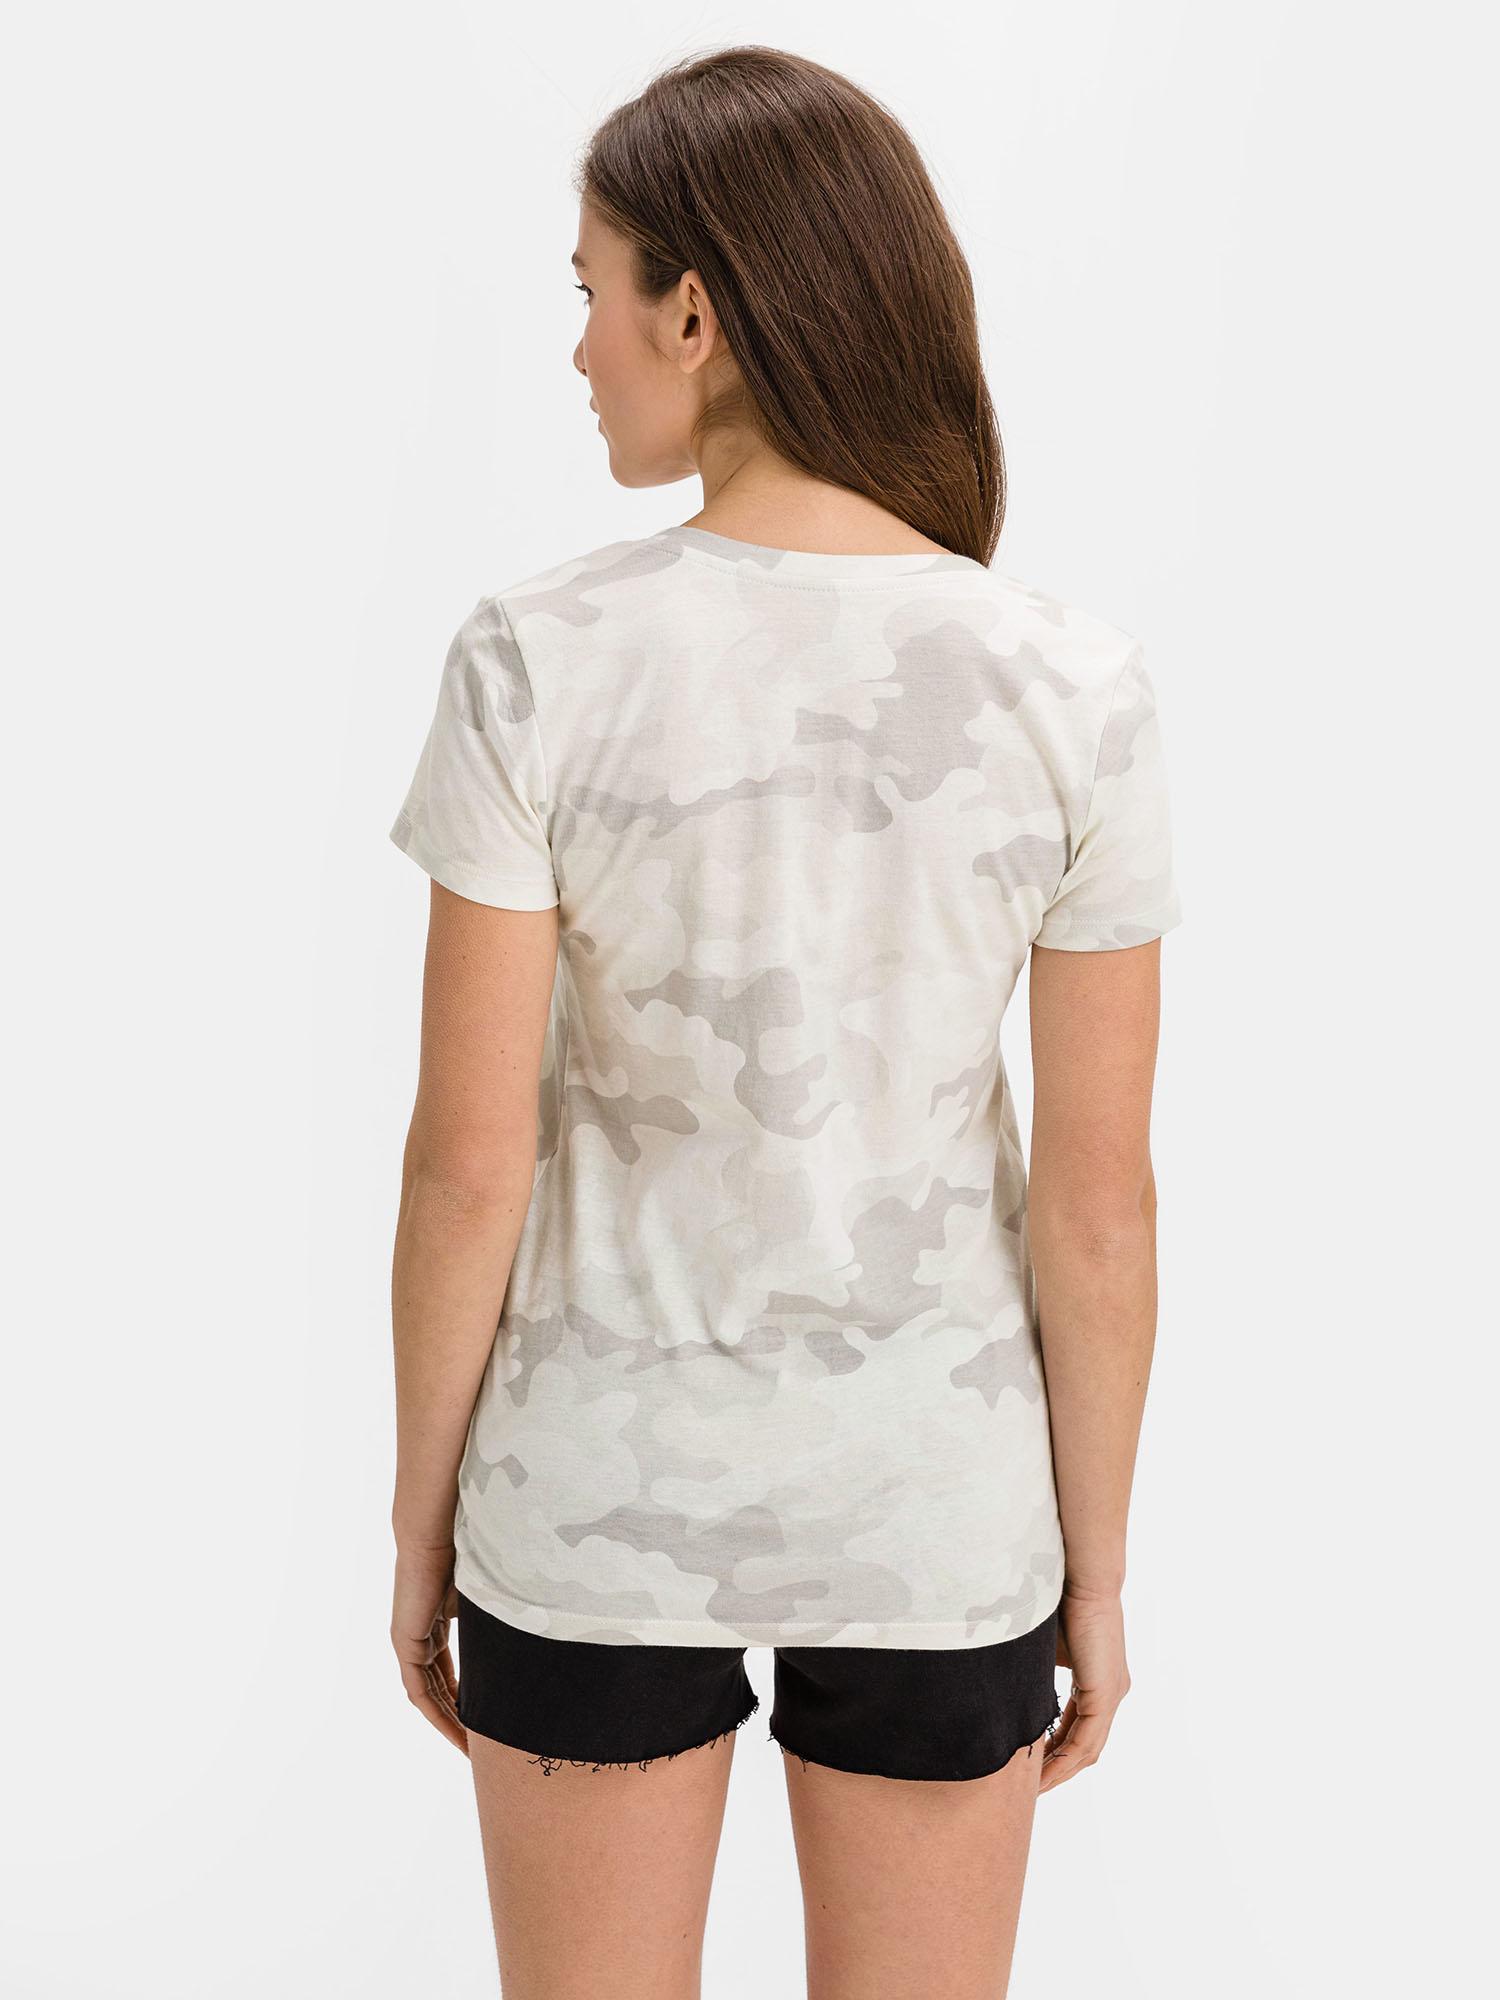 GAP šedé tričko se vzorem